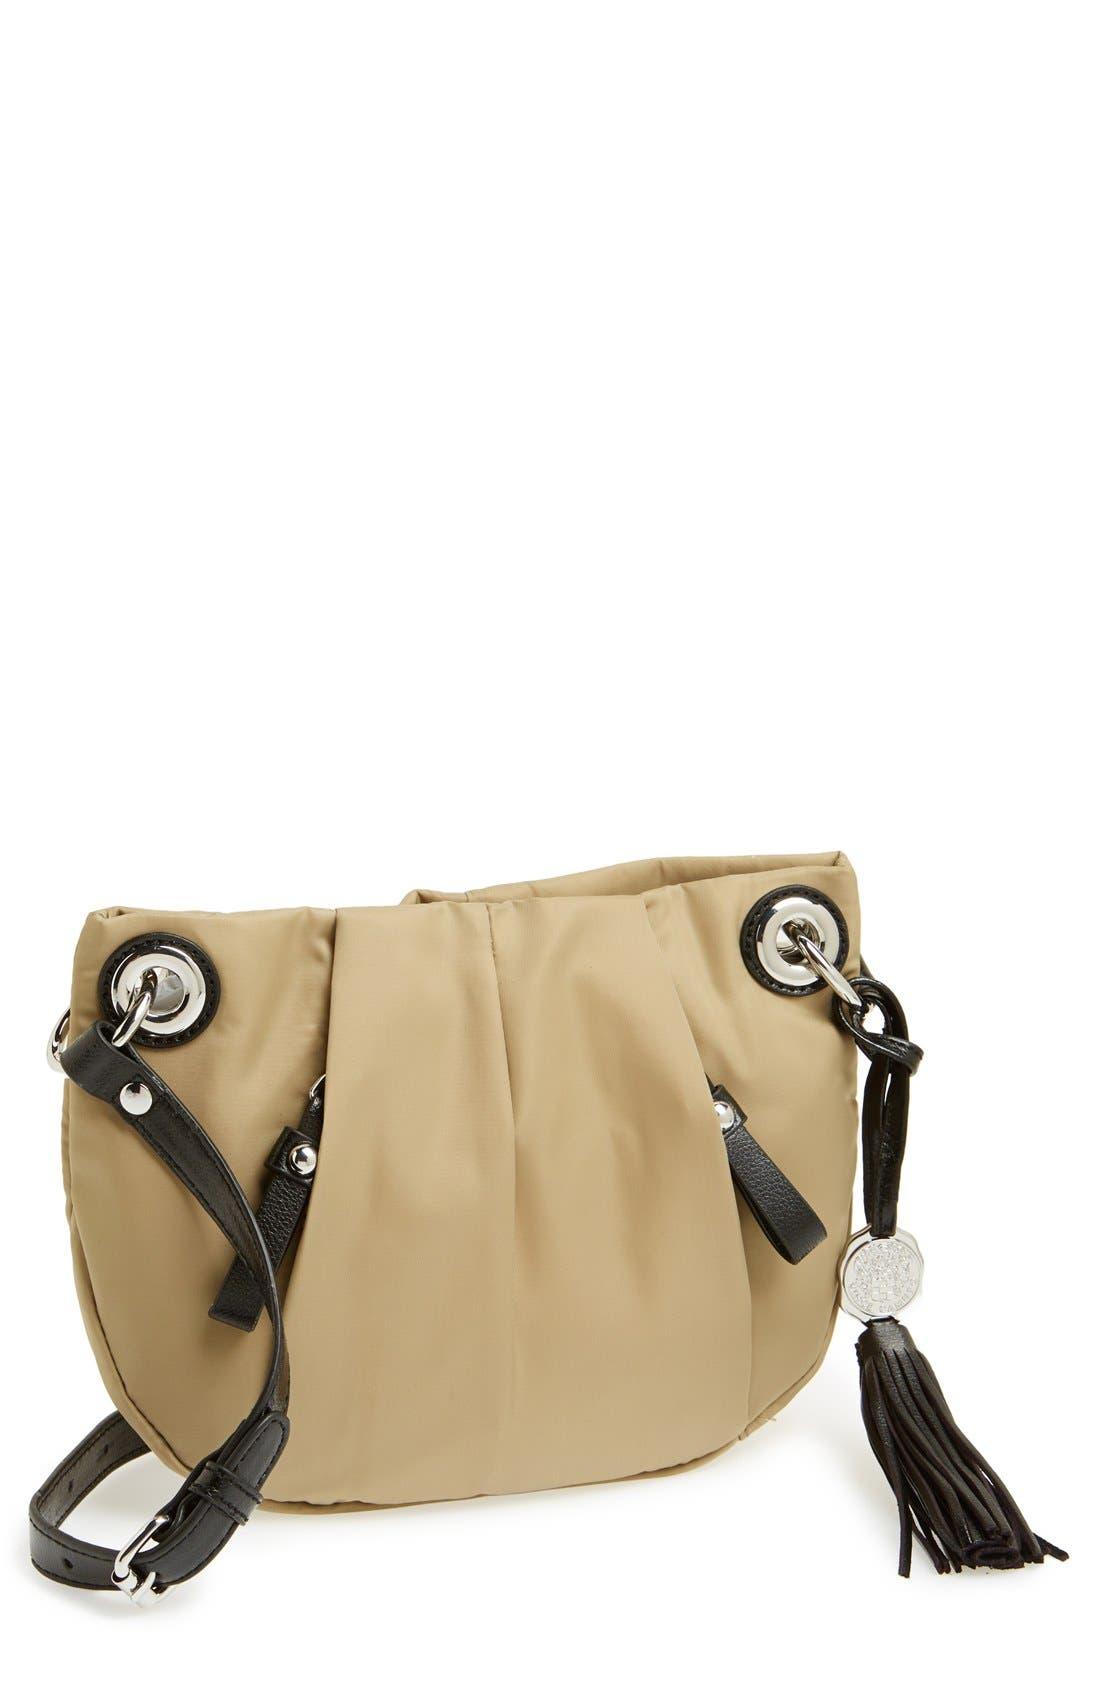 Alternate Image 1 Selected - Vince Camuto 'Cris' Nylon Crossbody Bag